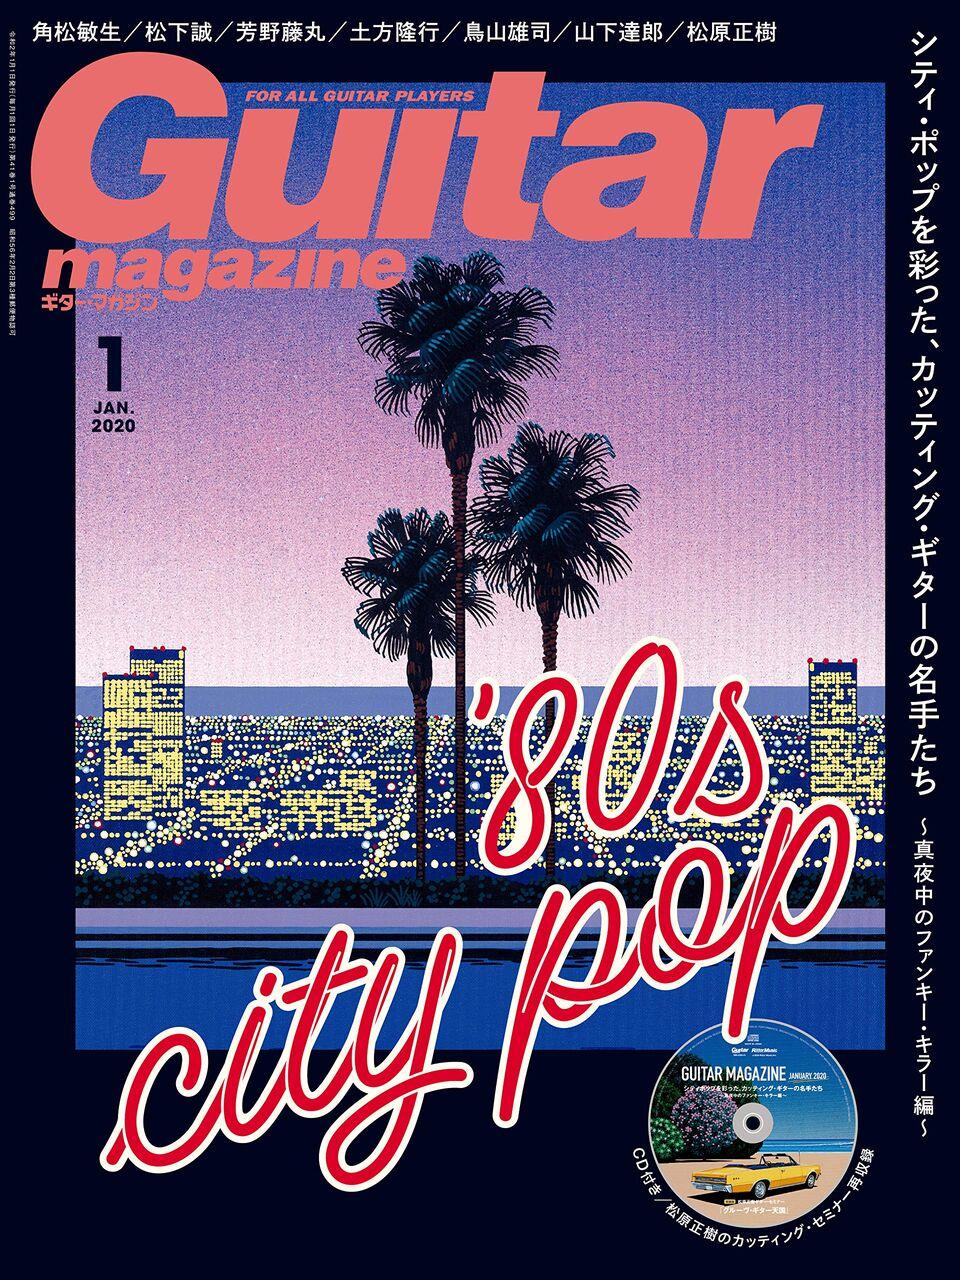 guitar magazine_19.12